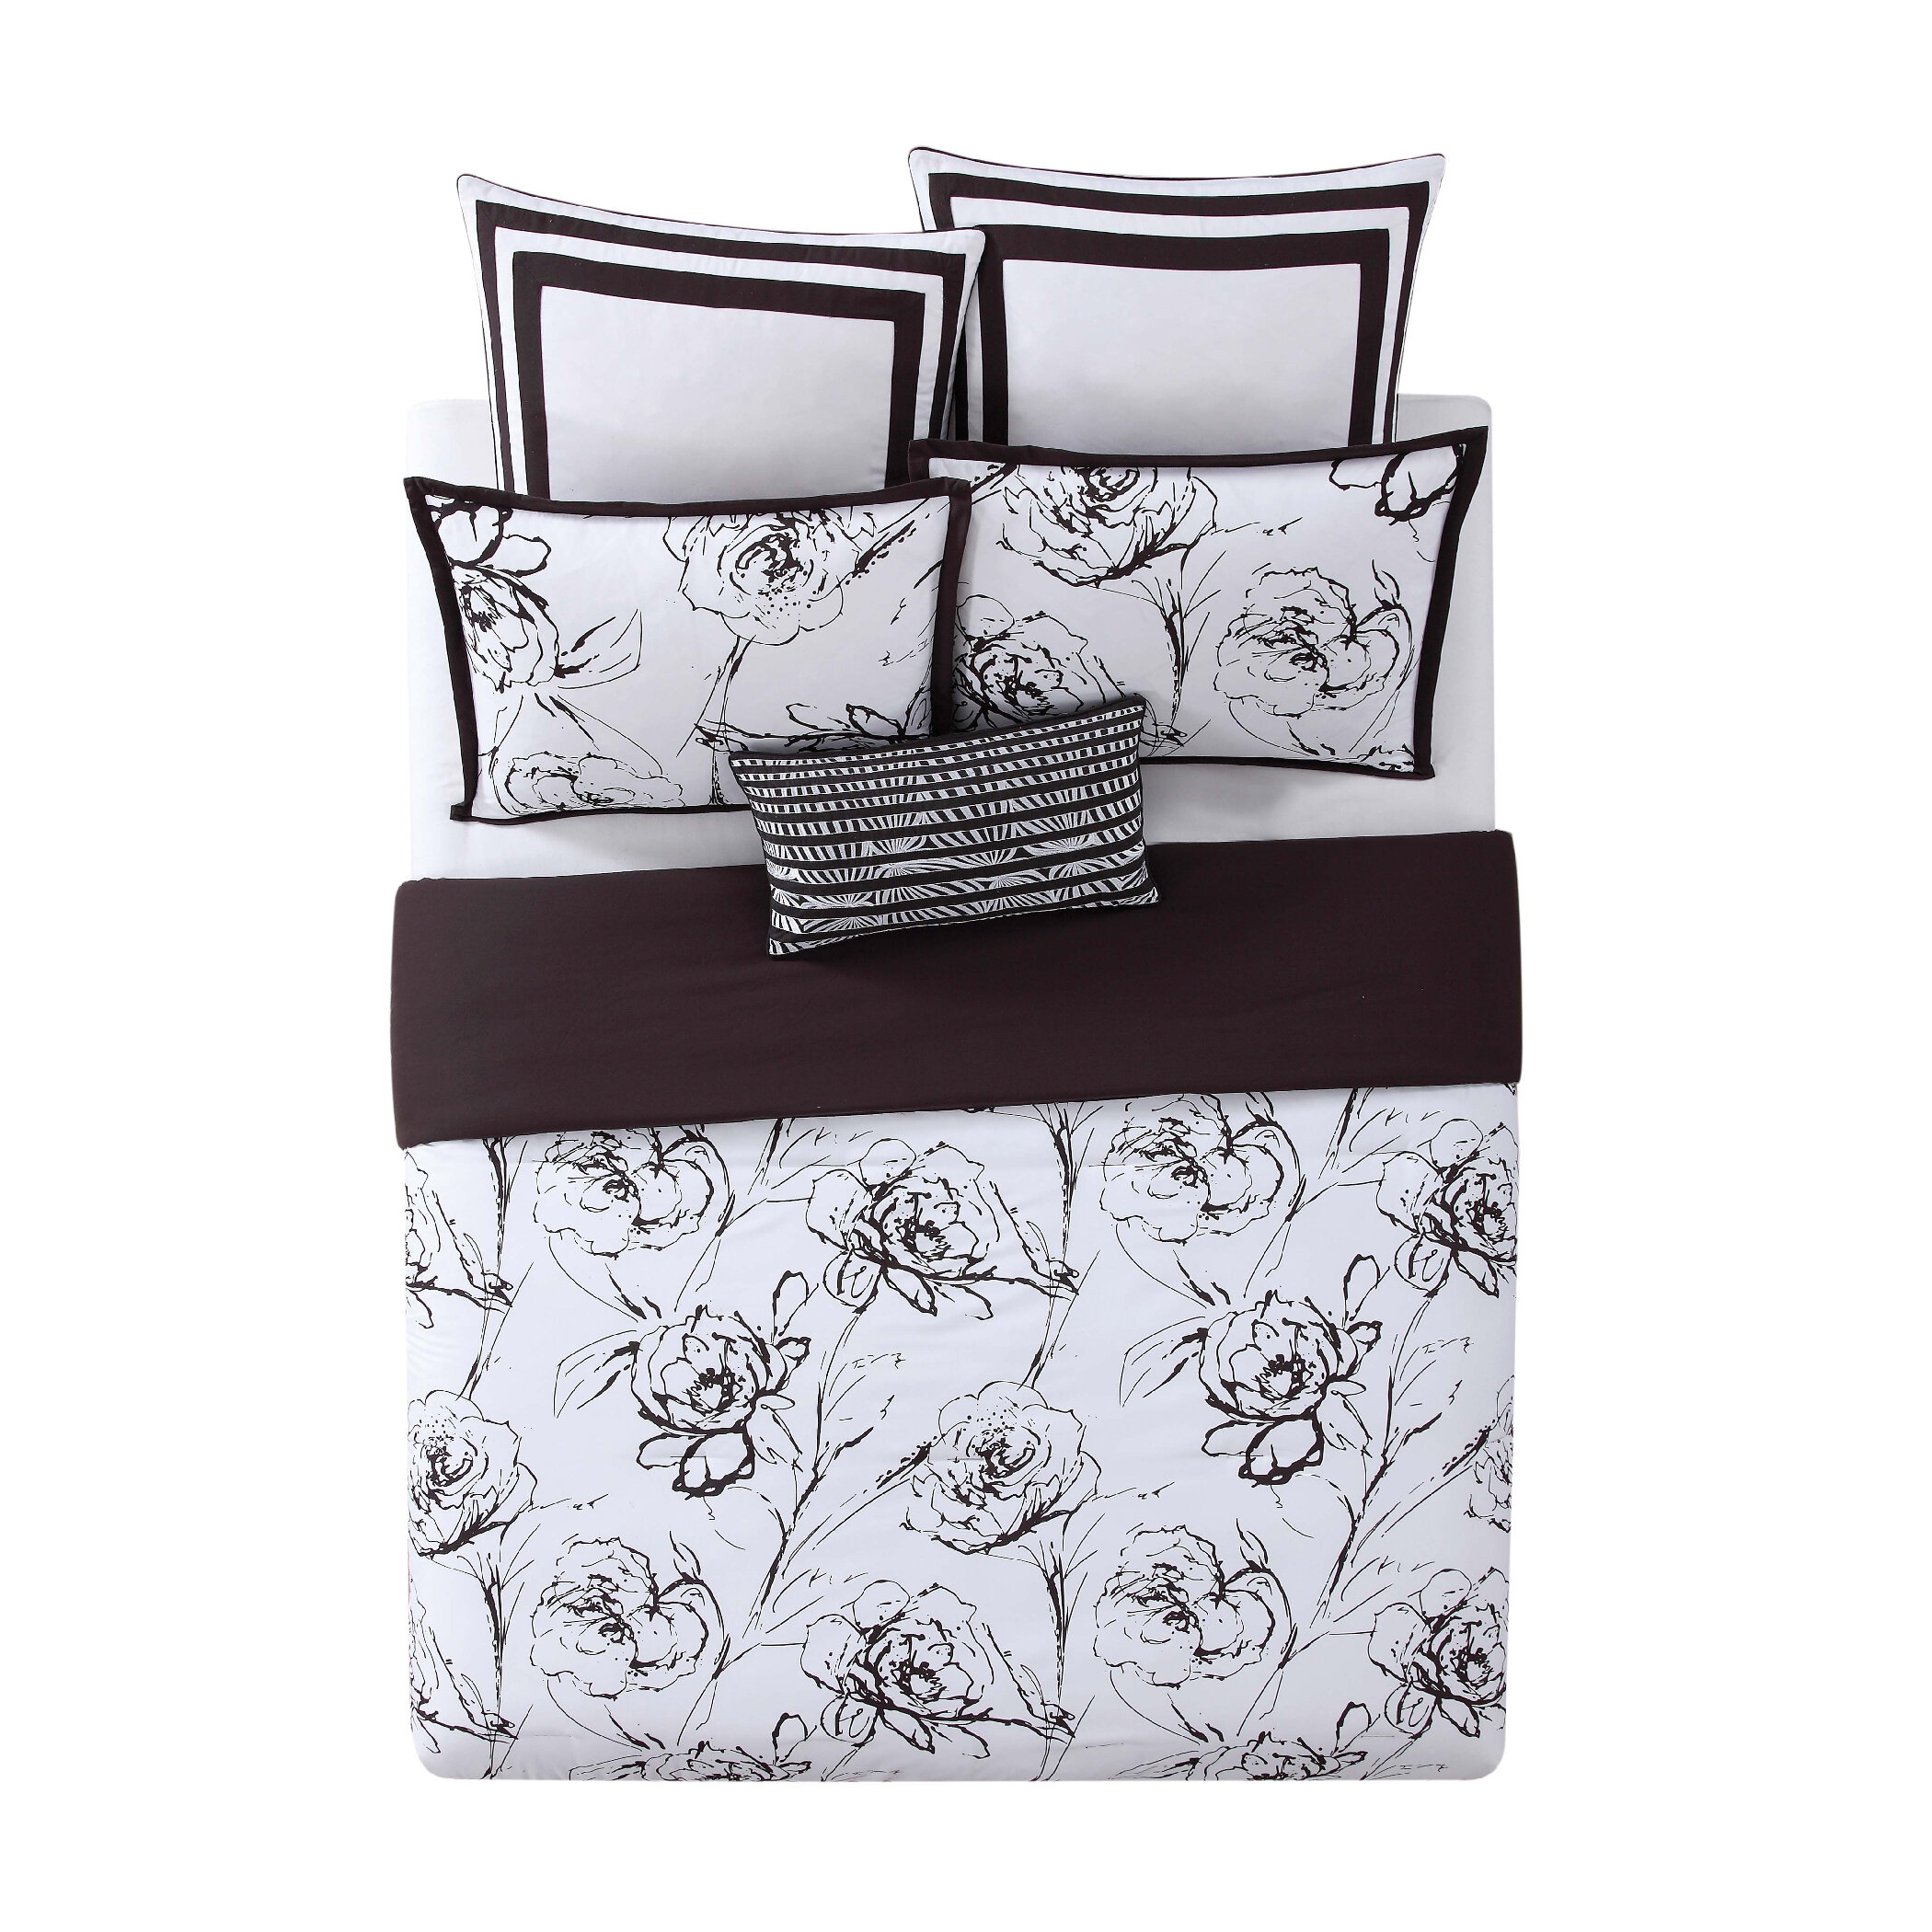 9de1356c2d4b8 Christian Siriano Graphic Floral Comforter Set